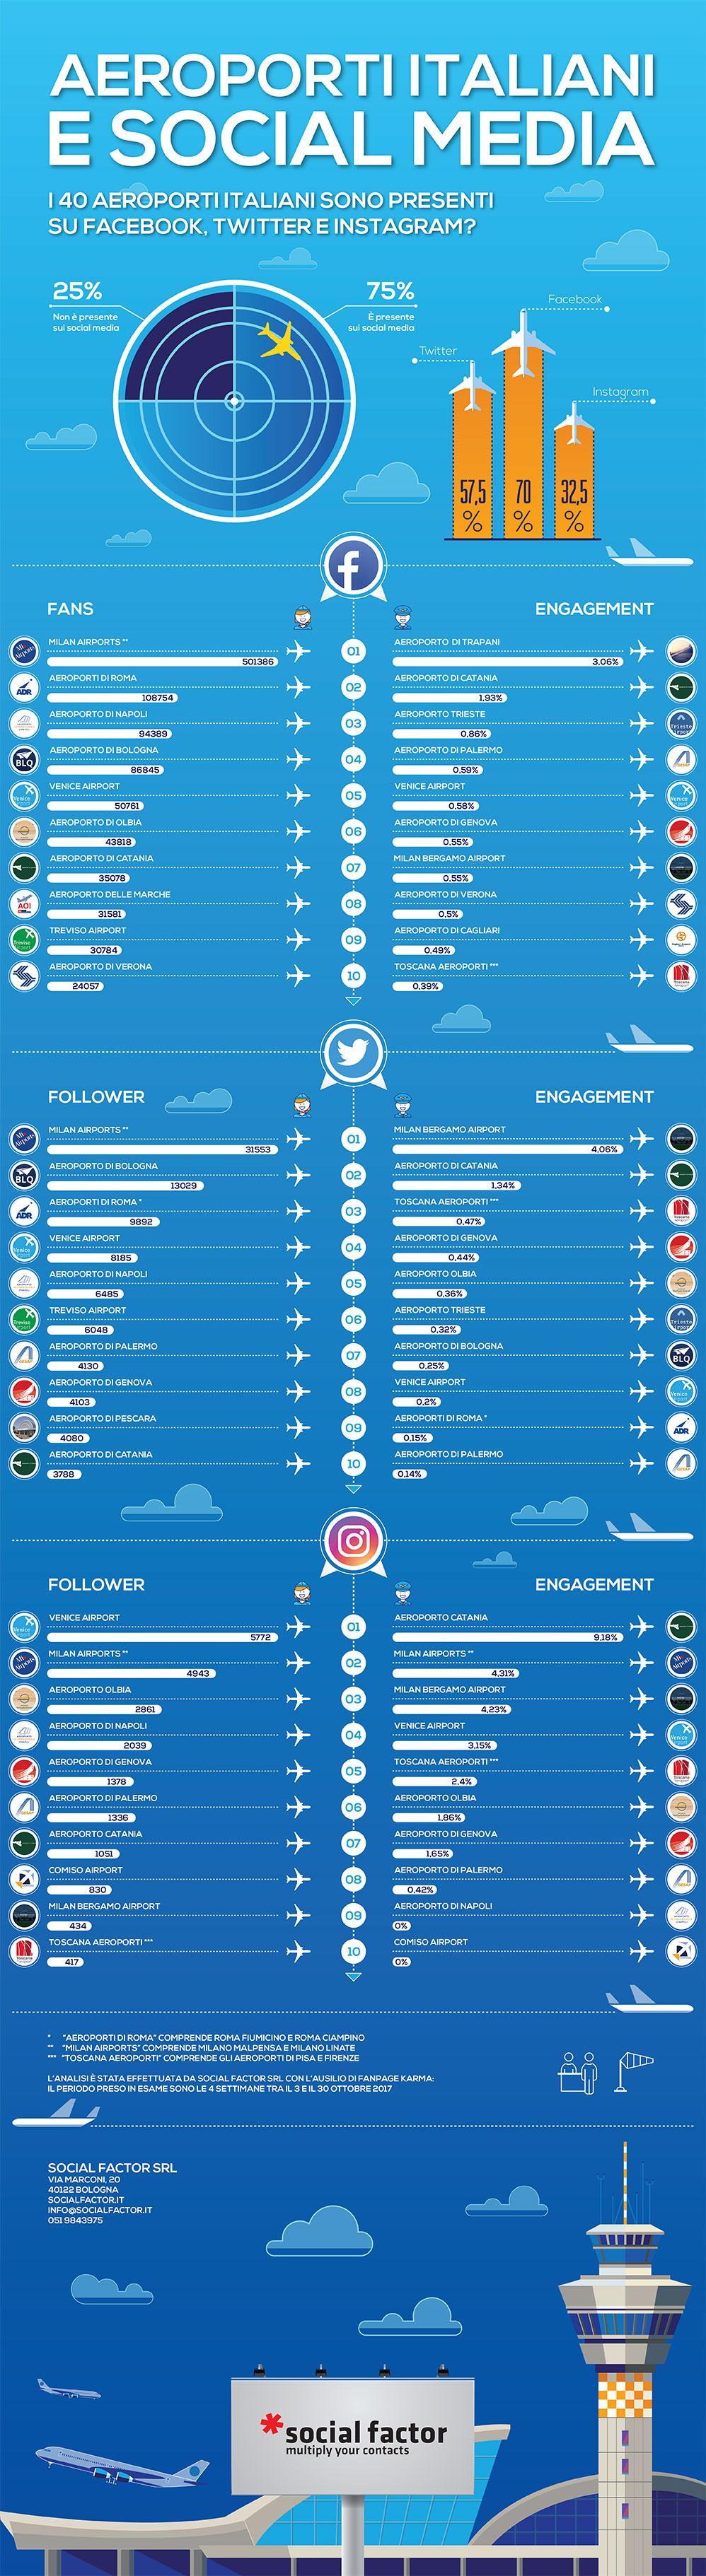 infografica aeroporti e social media